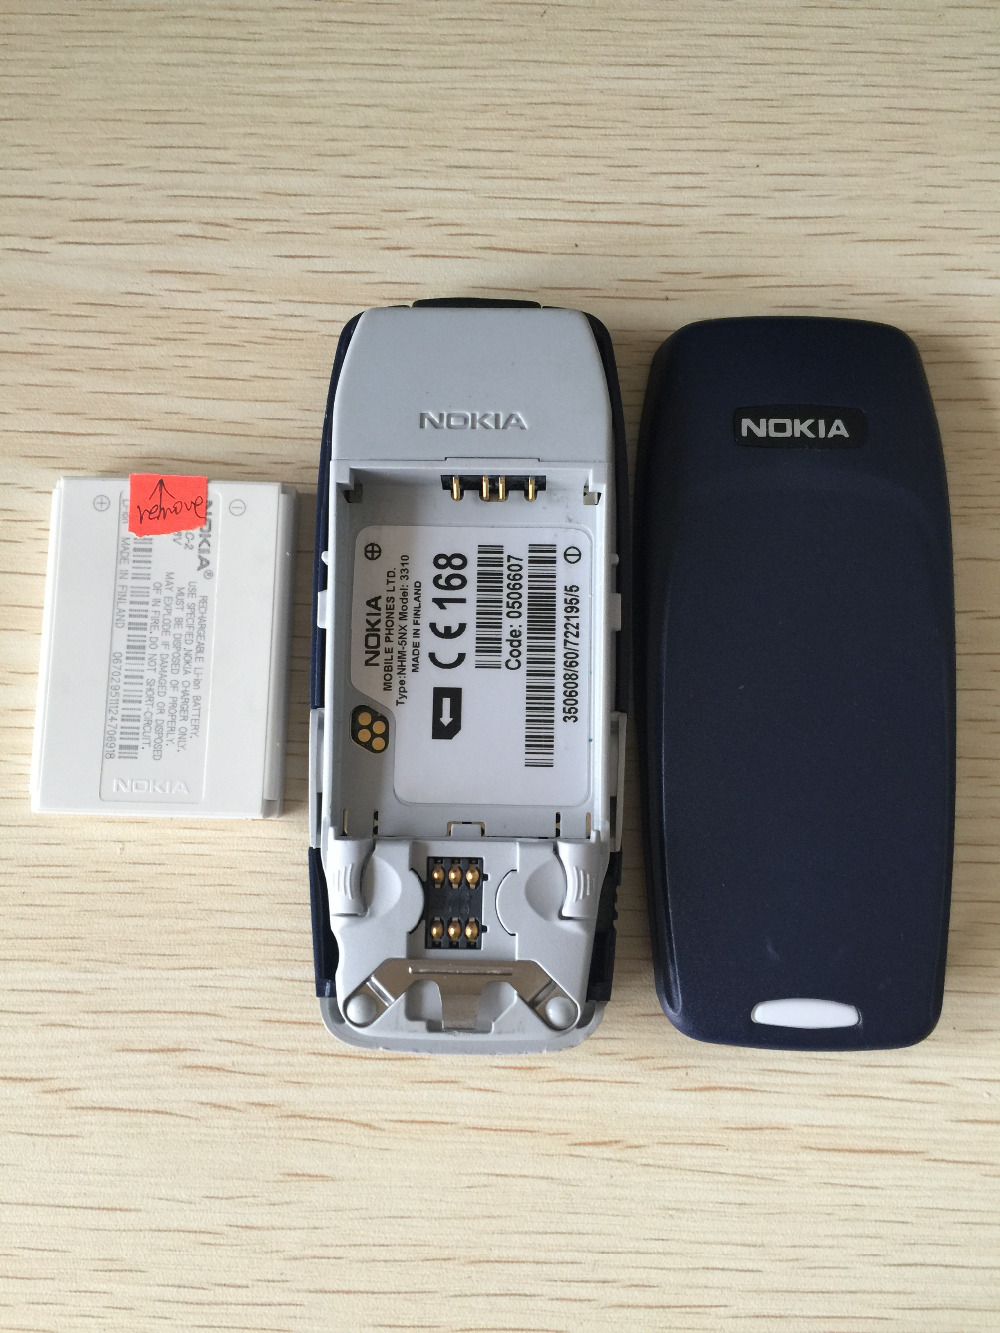 Refurbished phone Nokia 3310 cheap phone unlocked GSM 900/1800 with multi language dark blue 7